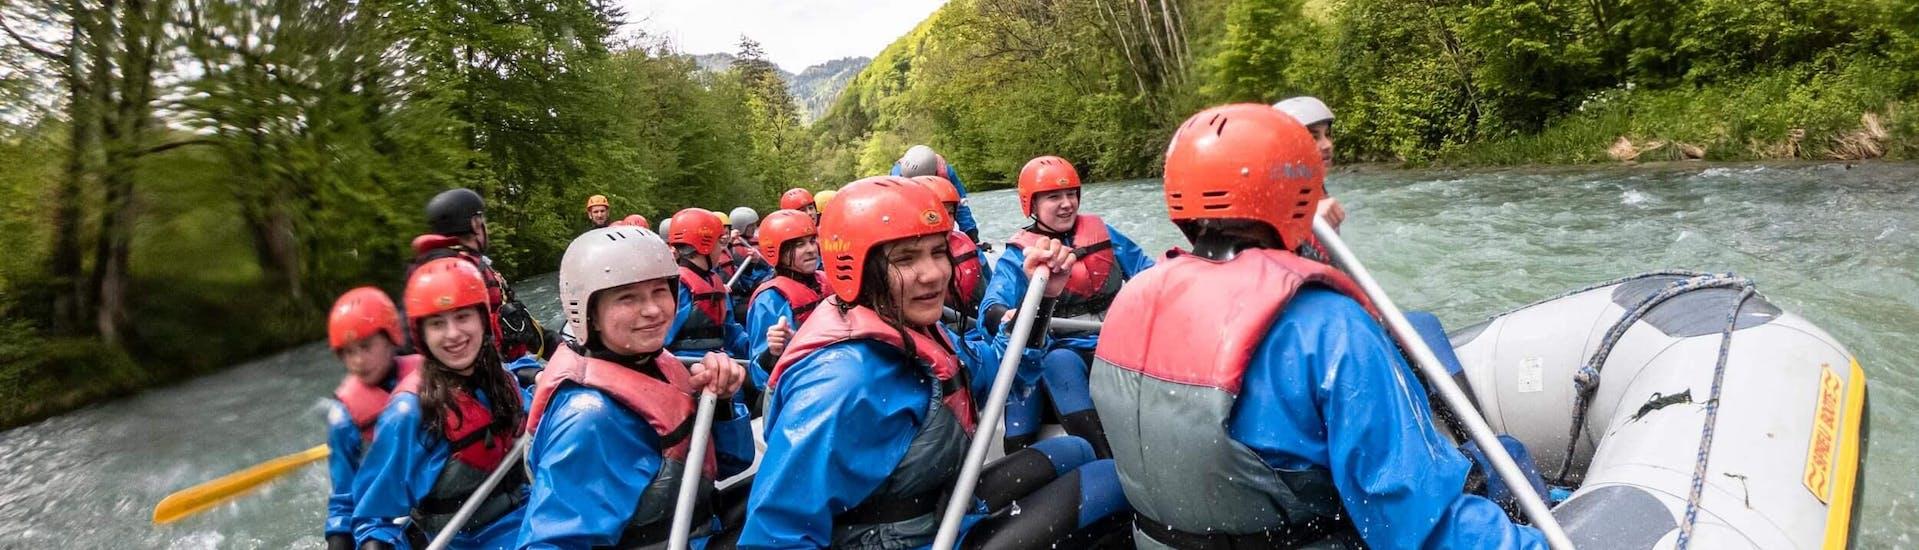 rafting-goll-tour-on-the-berchtesgadener-ache---afternoon-re-t-berchtesgaden-hero